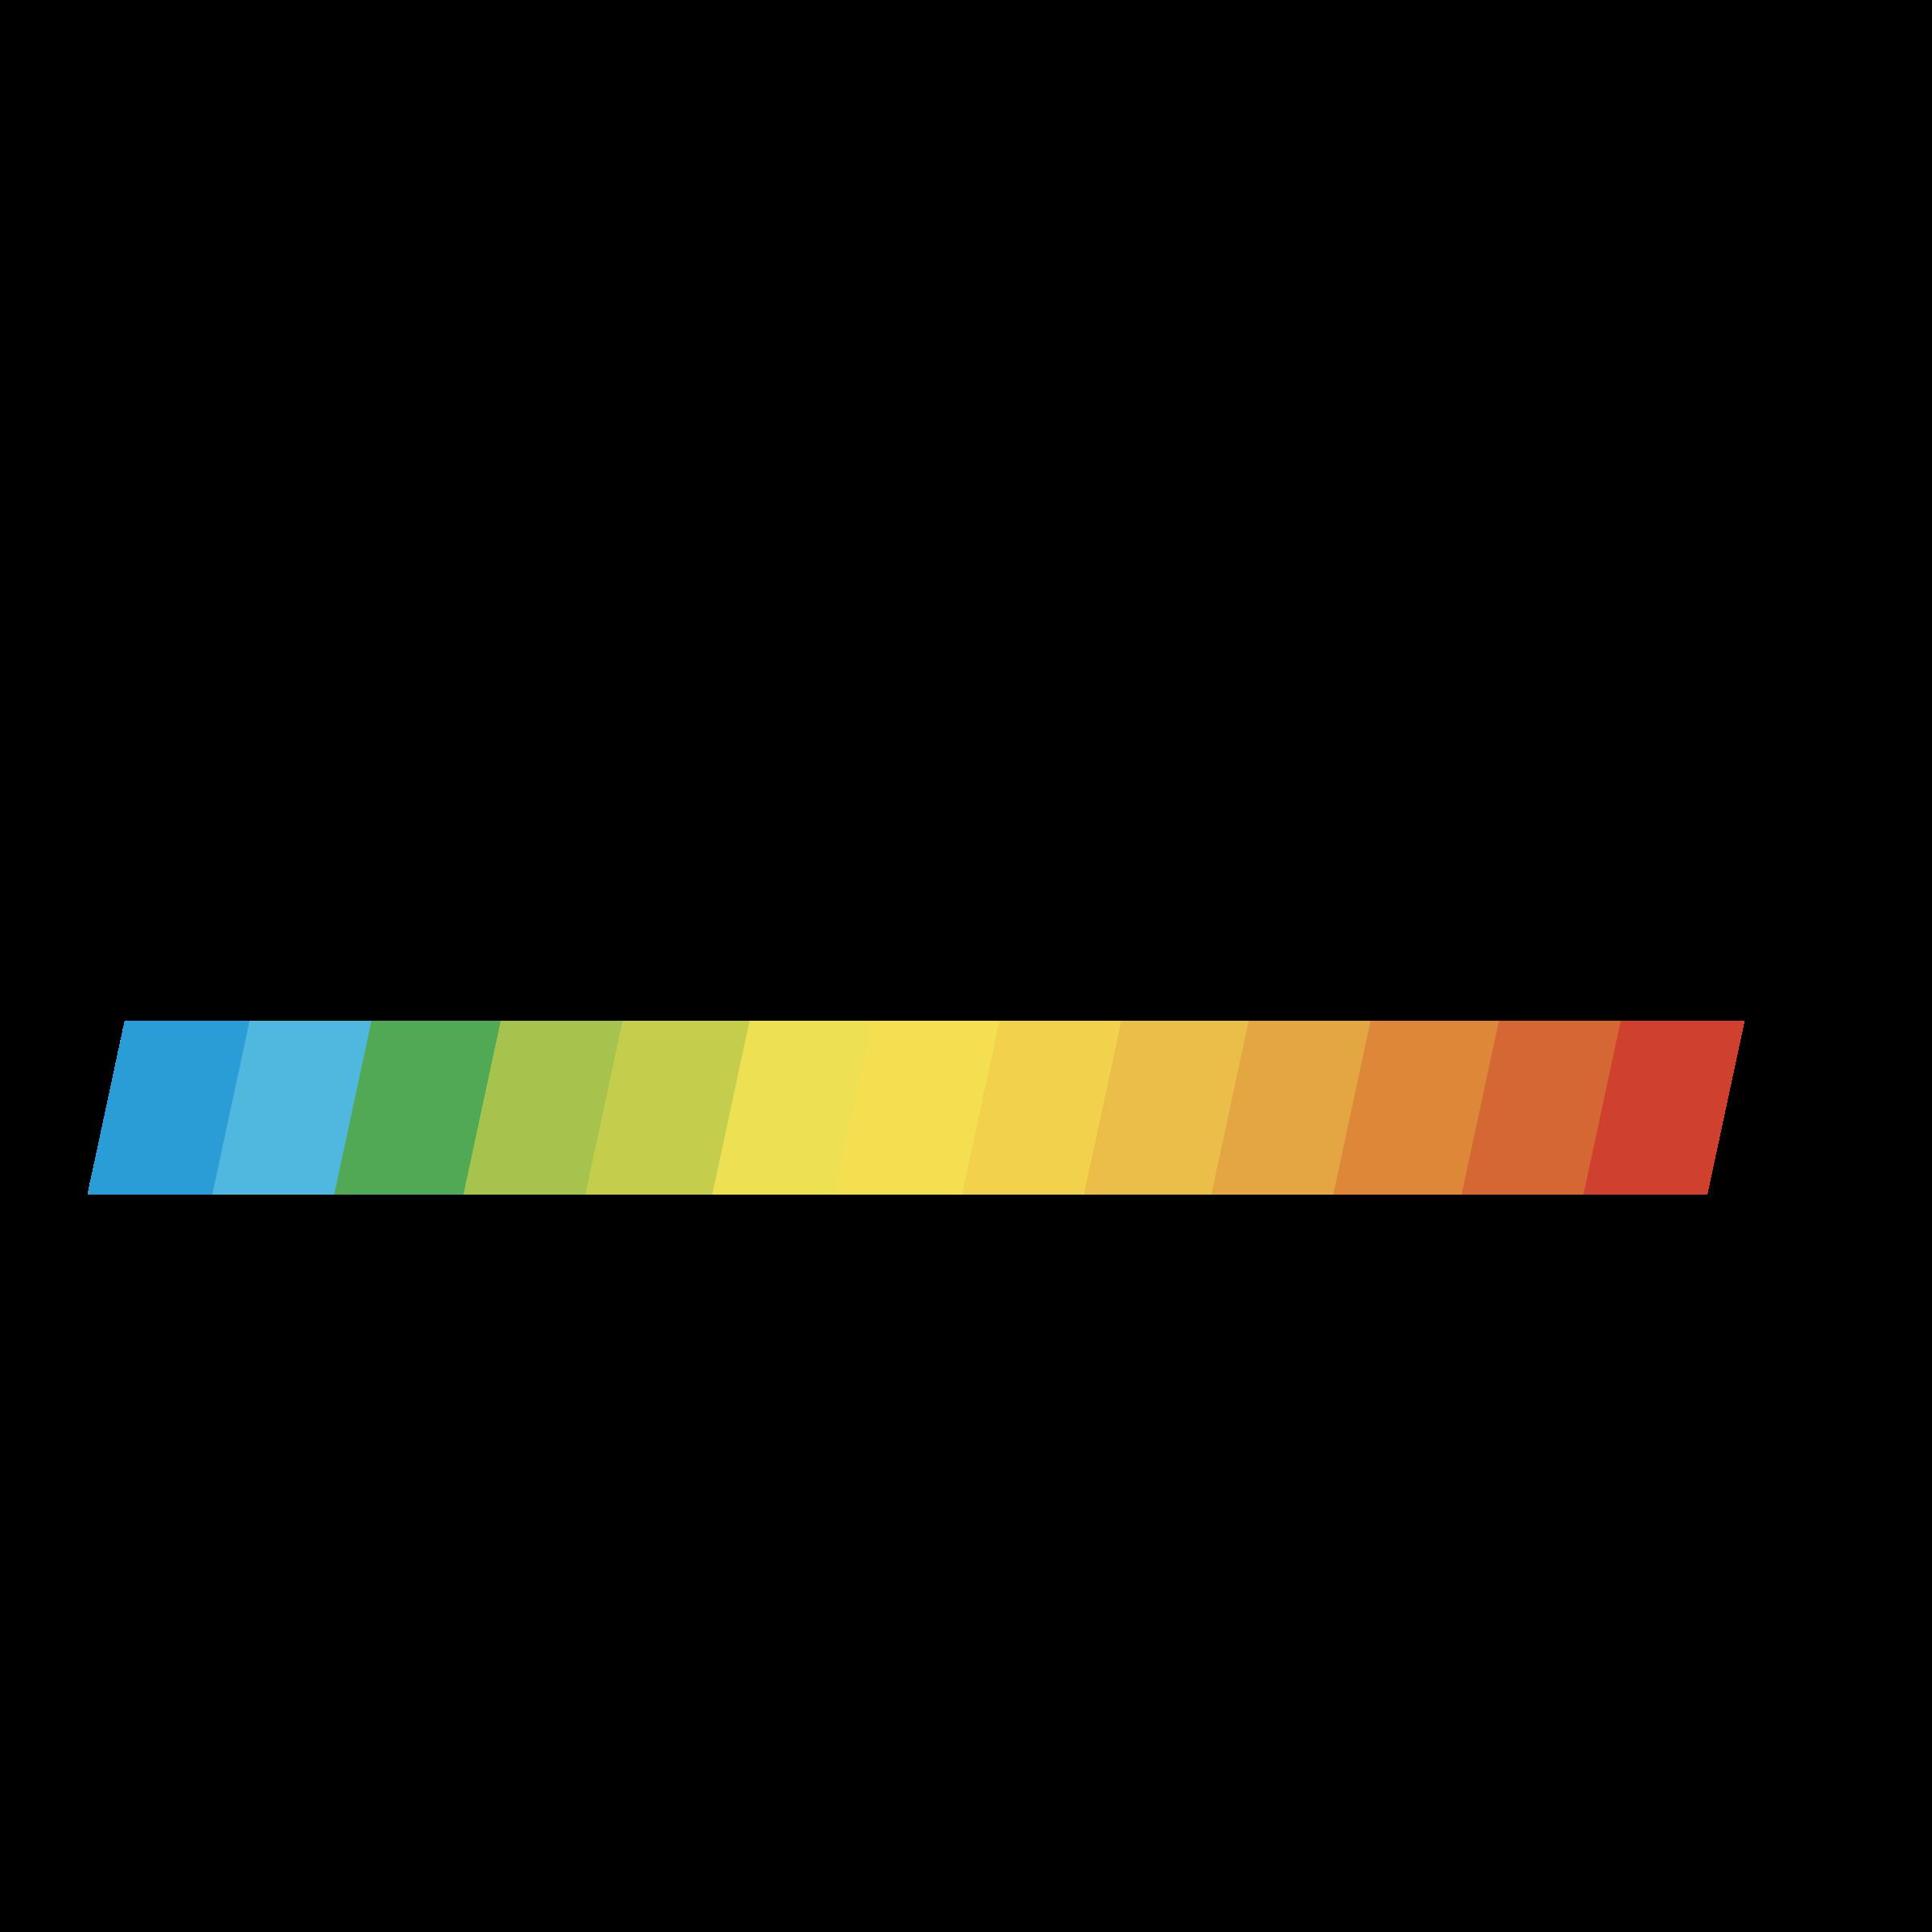 Centrum Logo PNG Transparent & SVG Vector.